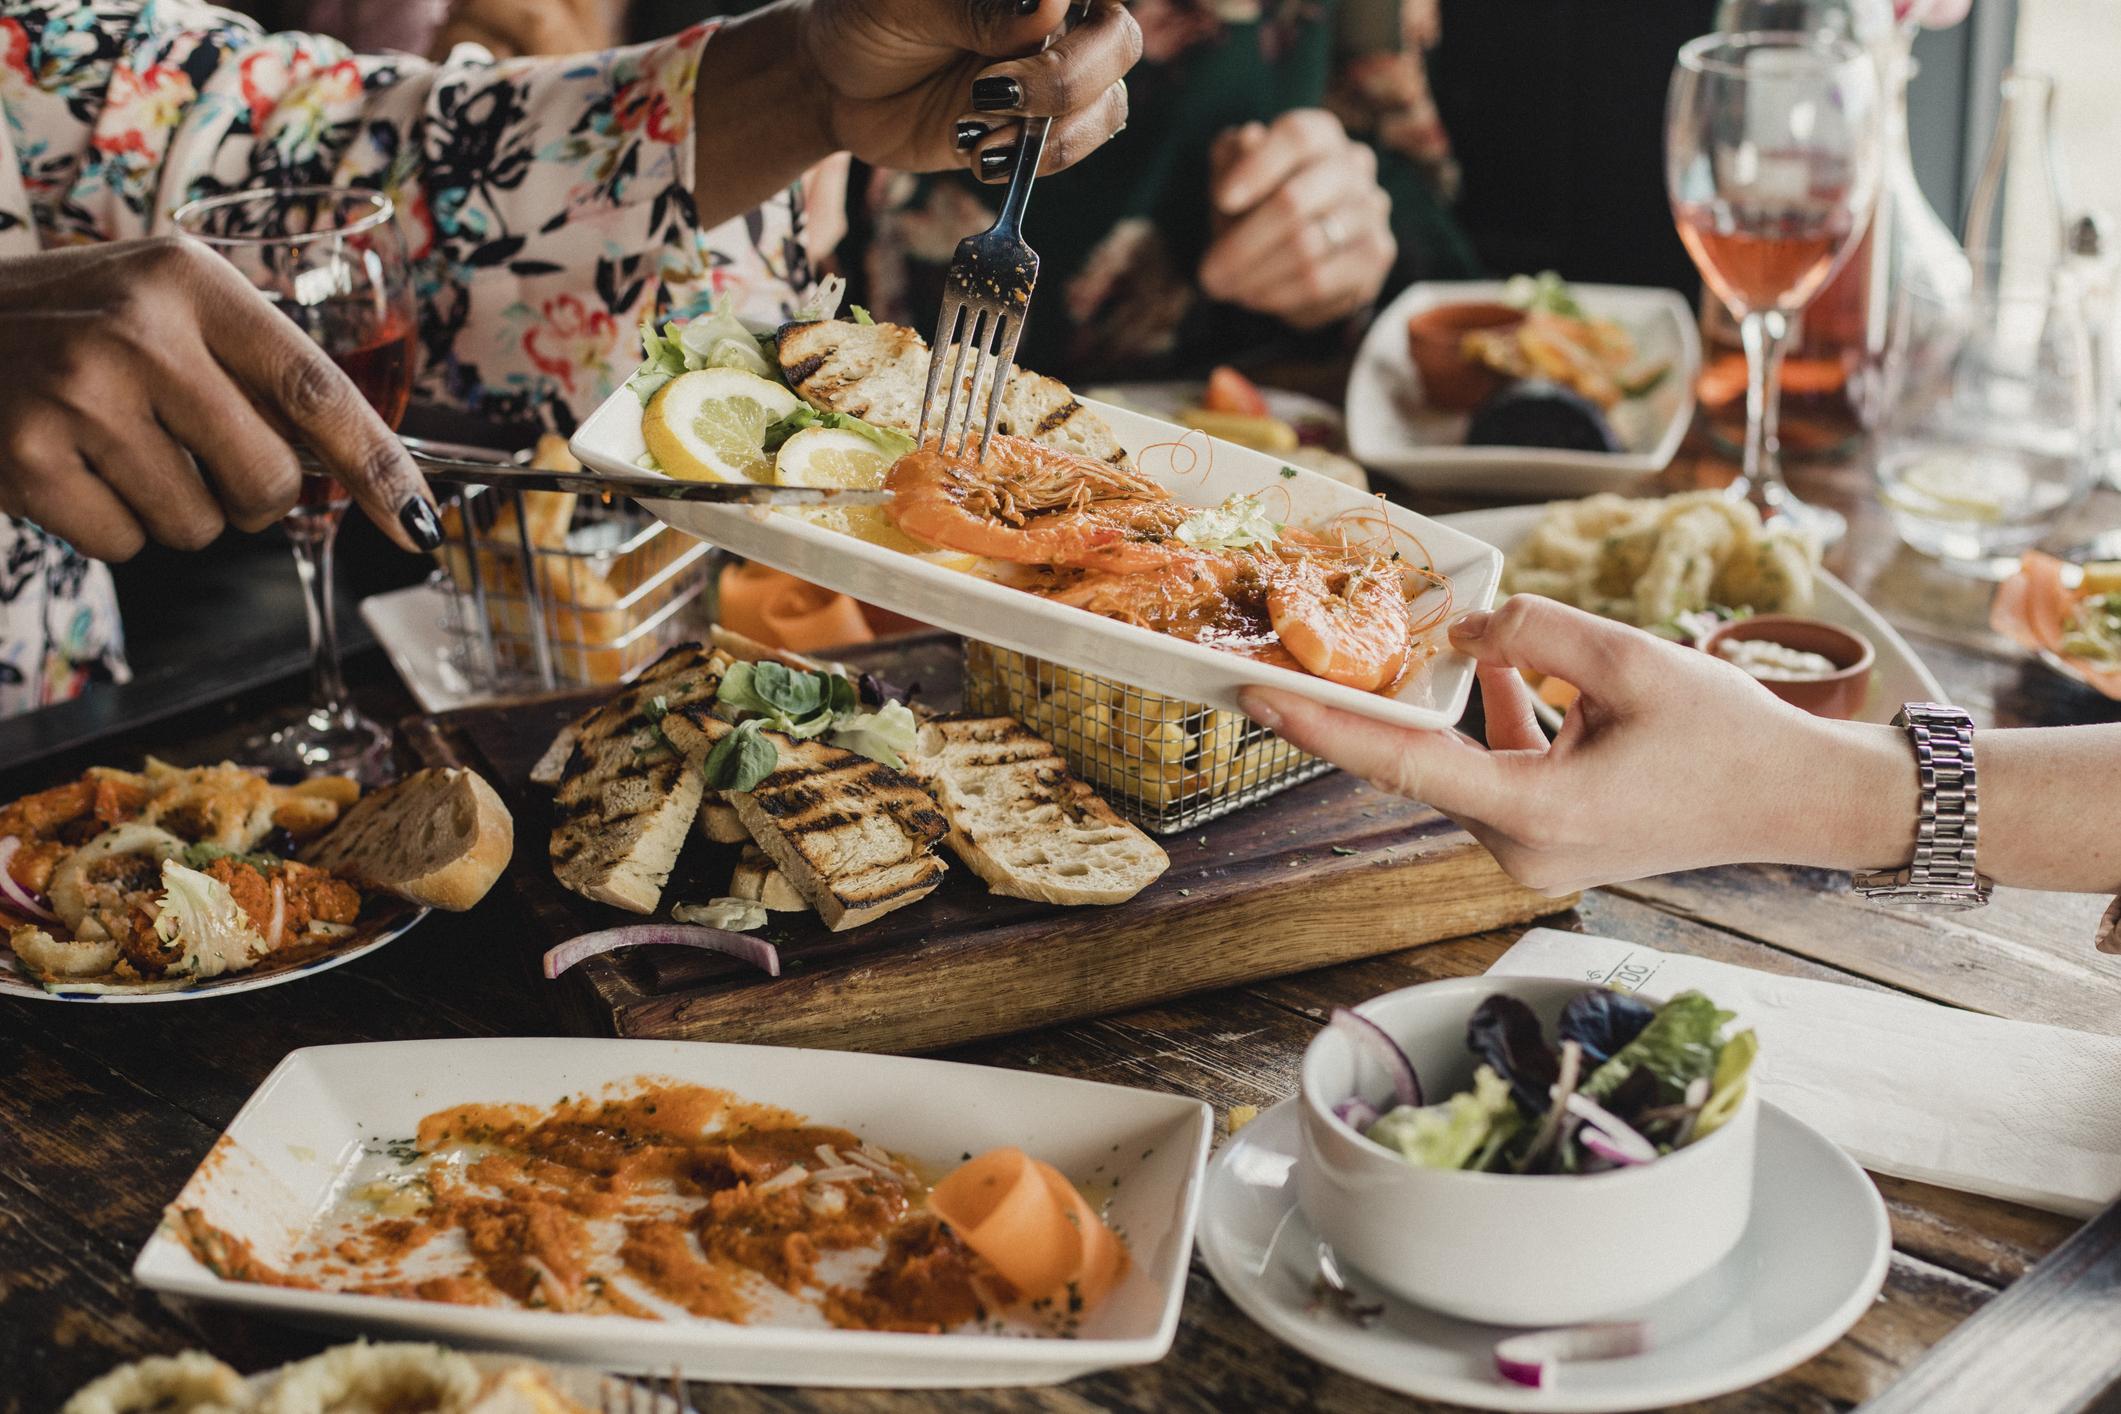 Crossword: Northeast Culinary Treats